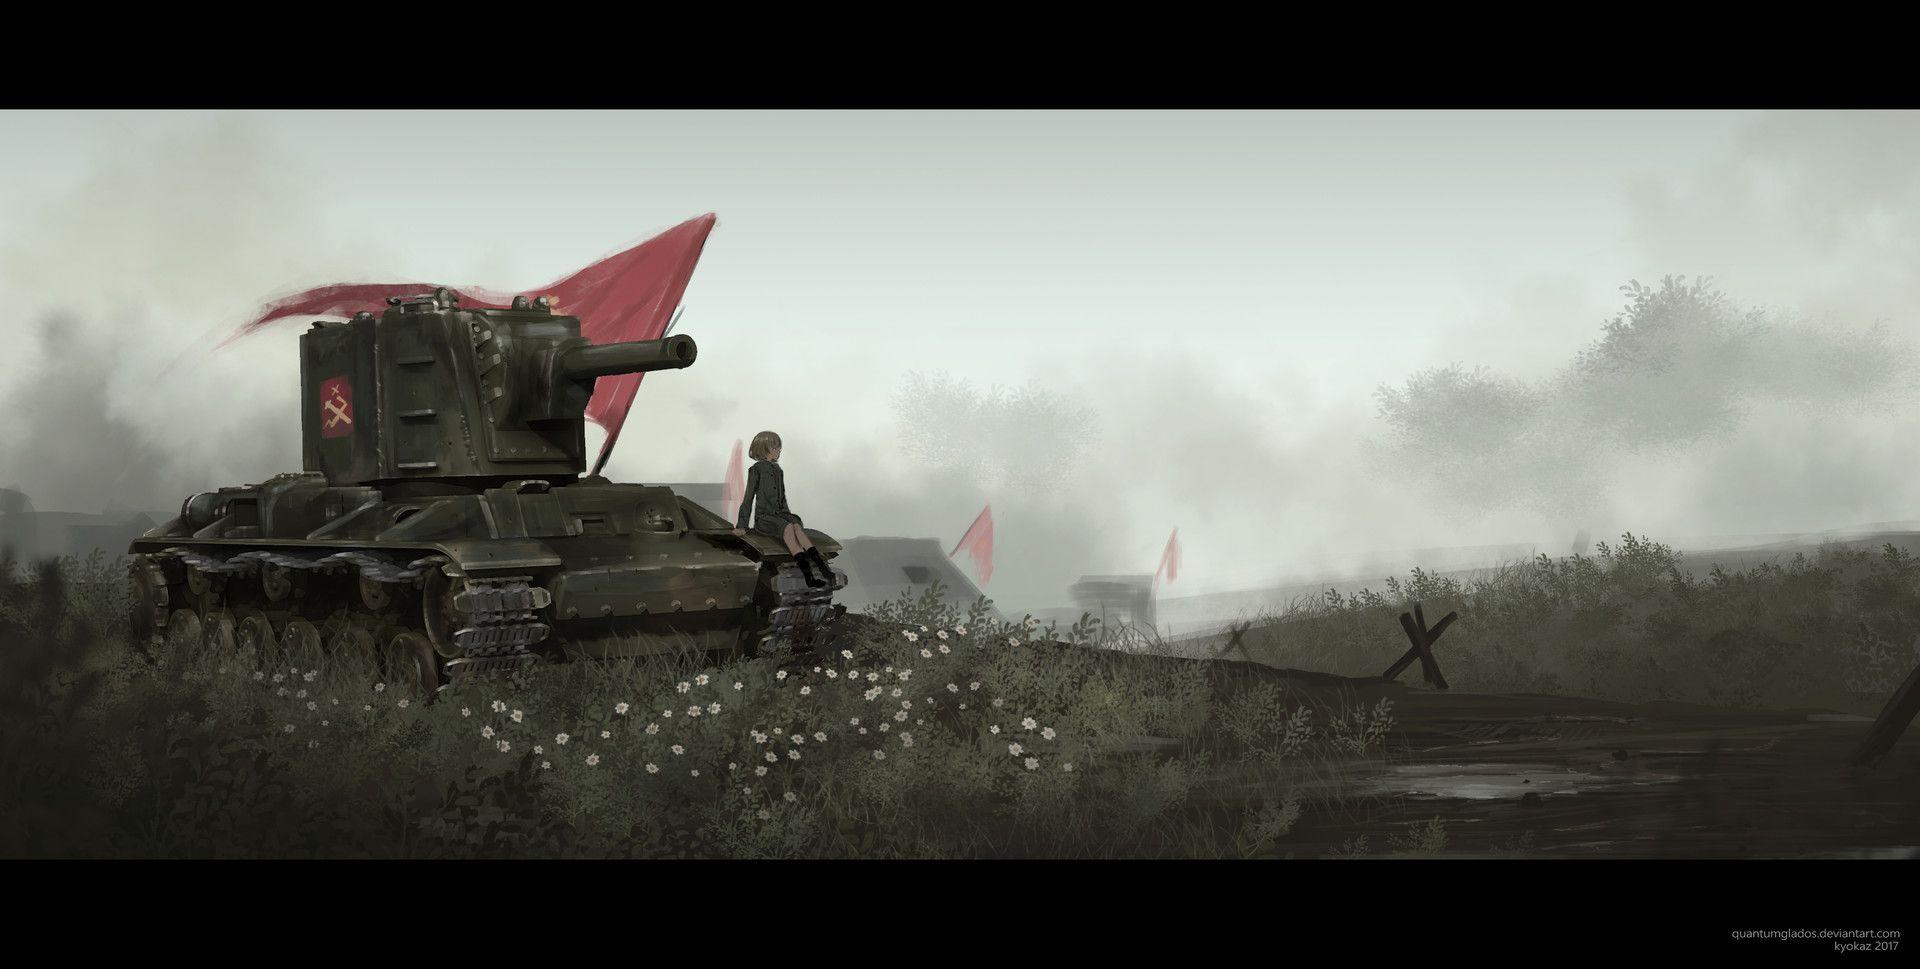 Start commanding your army in these tank games now. ArtStation - KV-2, Faiz Azhar | Anime military, Tank girl, Historical anime